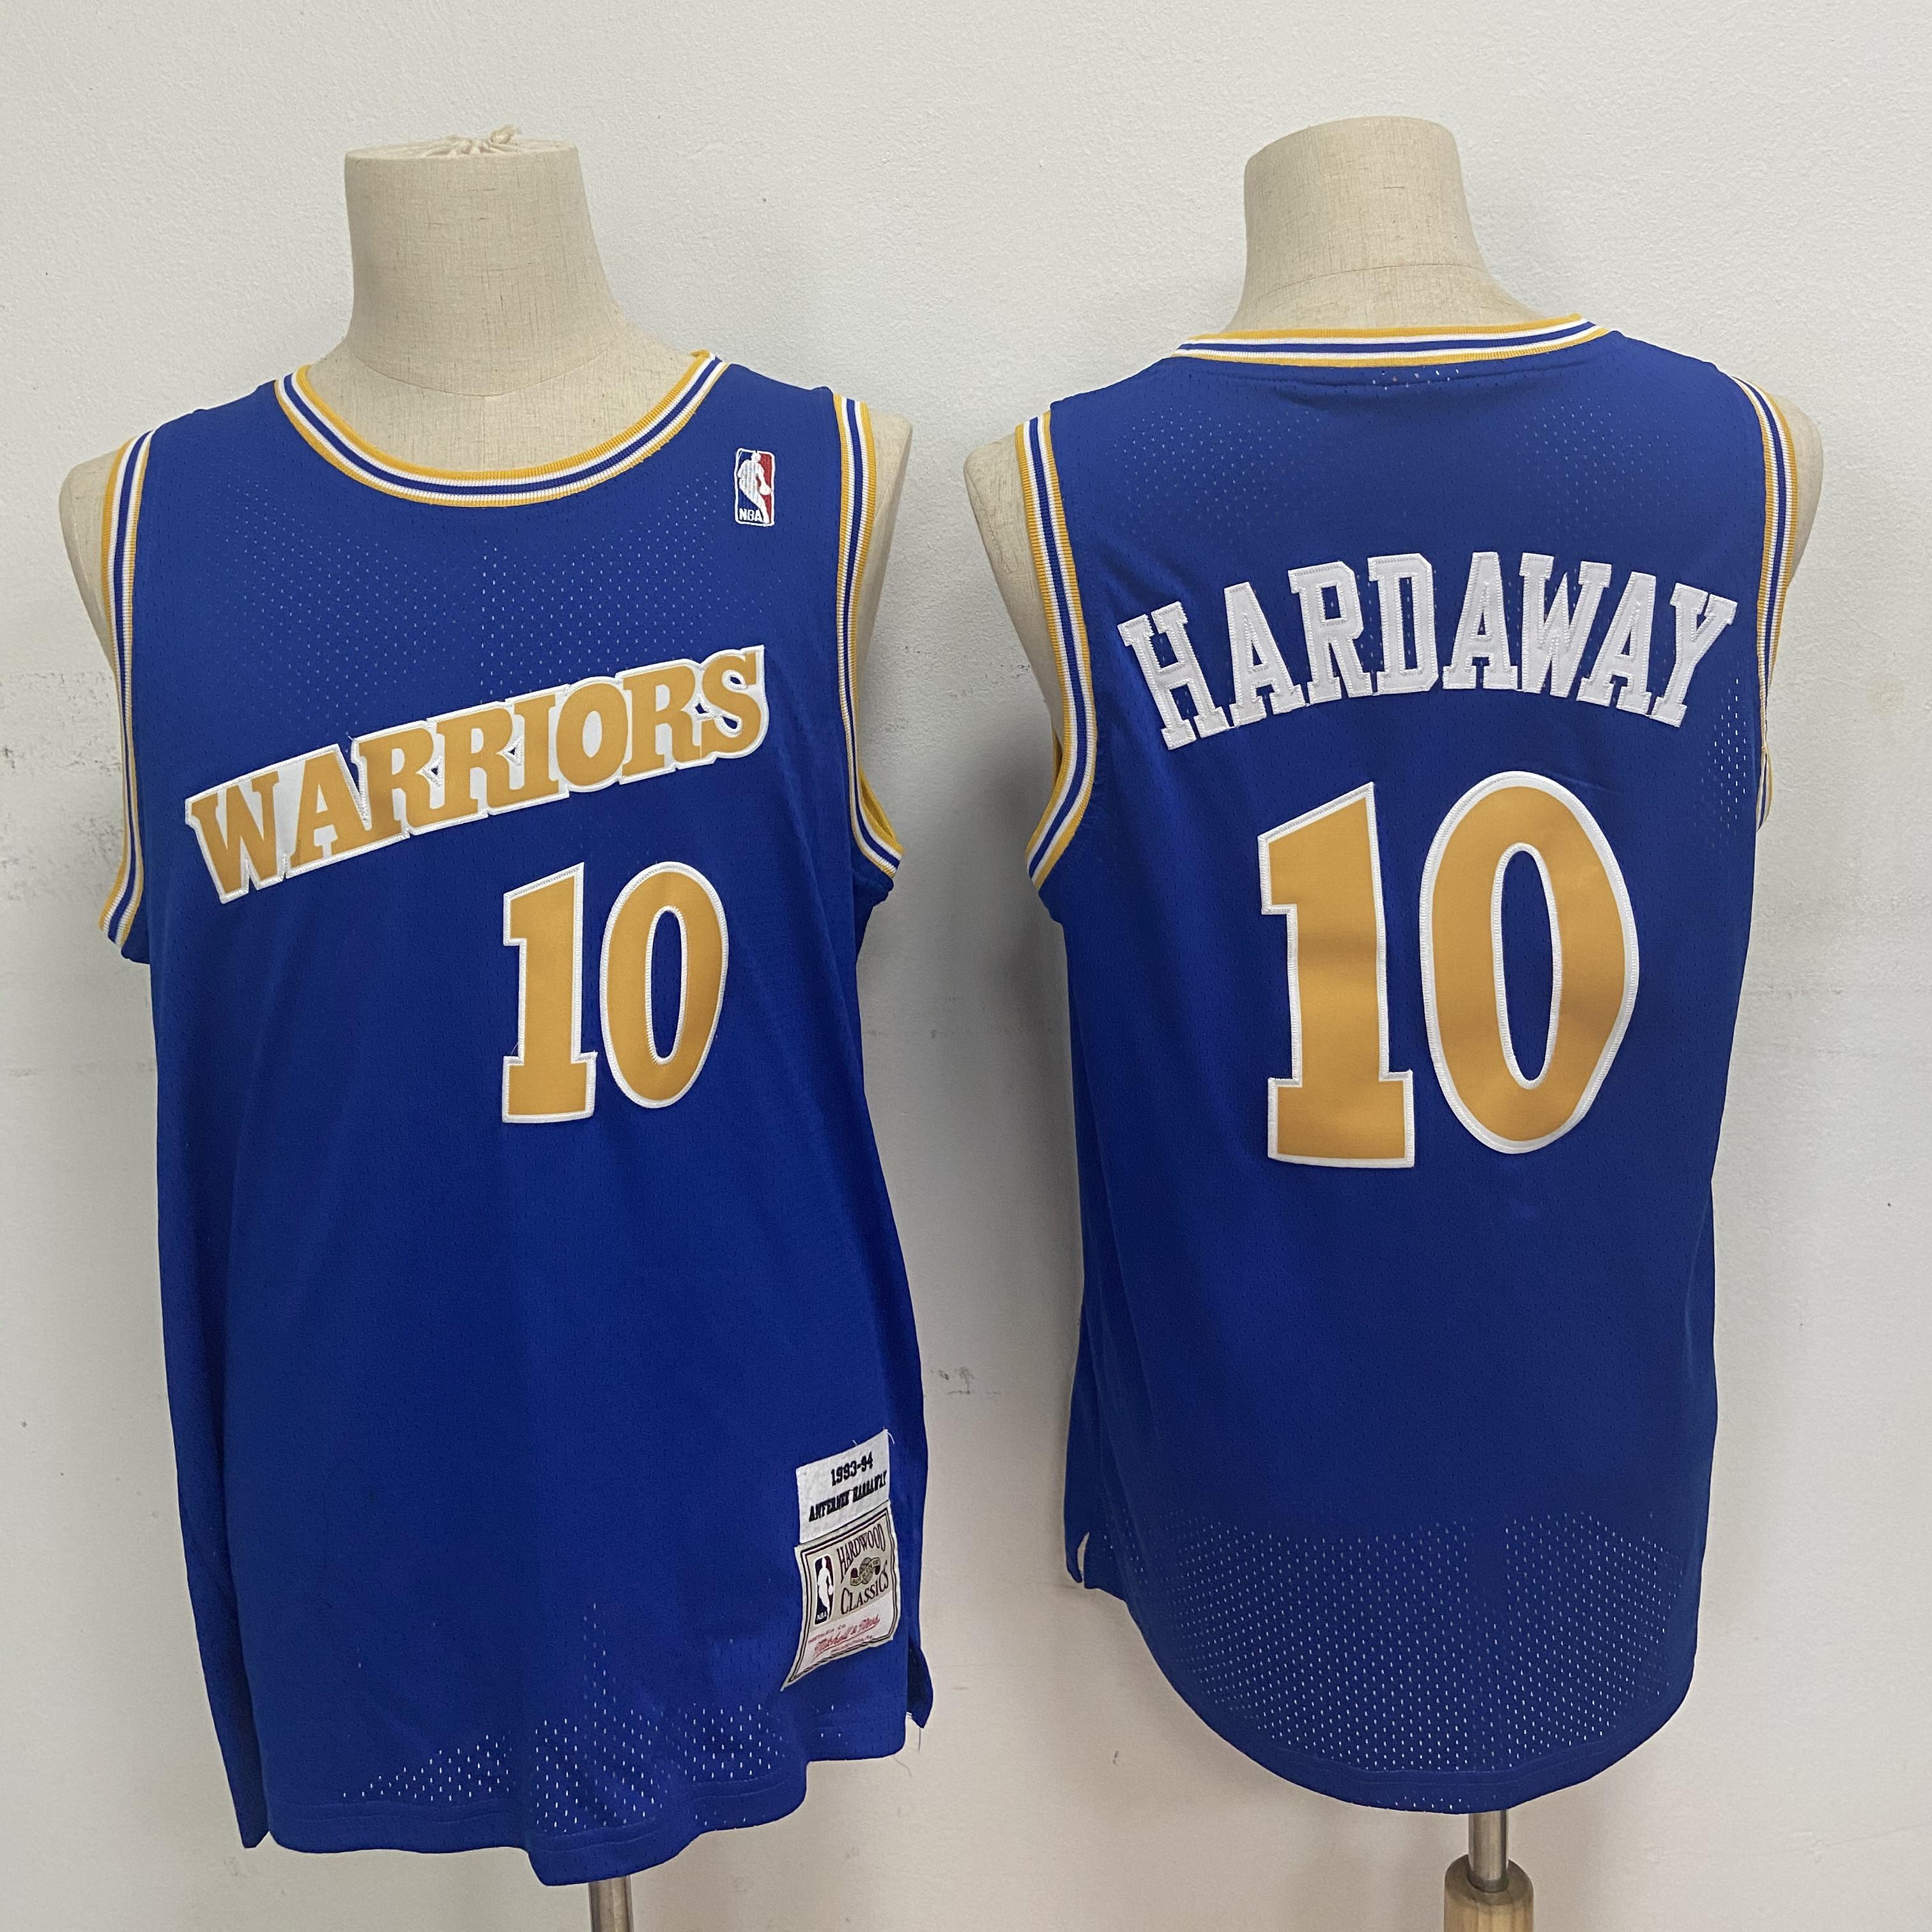 Warriors 10 Tim Hardaway Blue 1993-94 Hardwood Classics Jersey